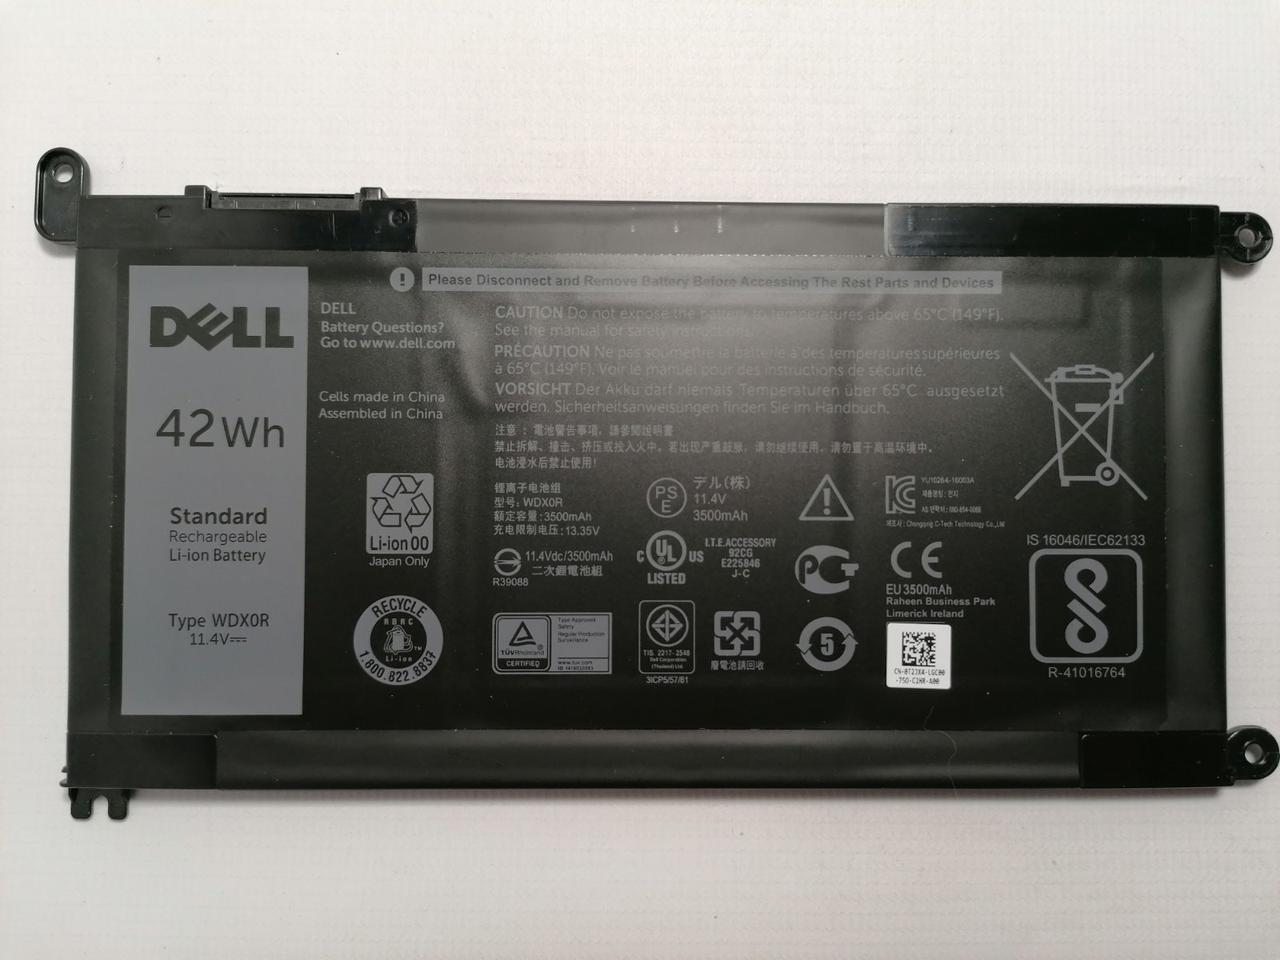 Б/У Оригинальная батарея для ноутбука Dell Inspiron 13 5368 5378 5379, 15 5565 5567 7569 7579, 17 5767 WDX0R